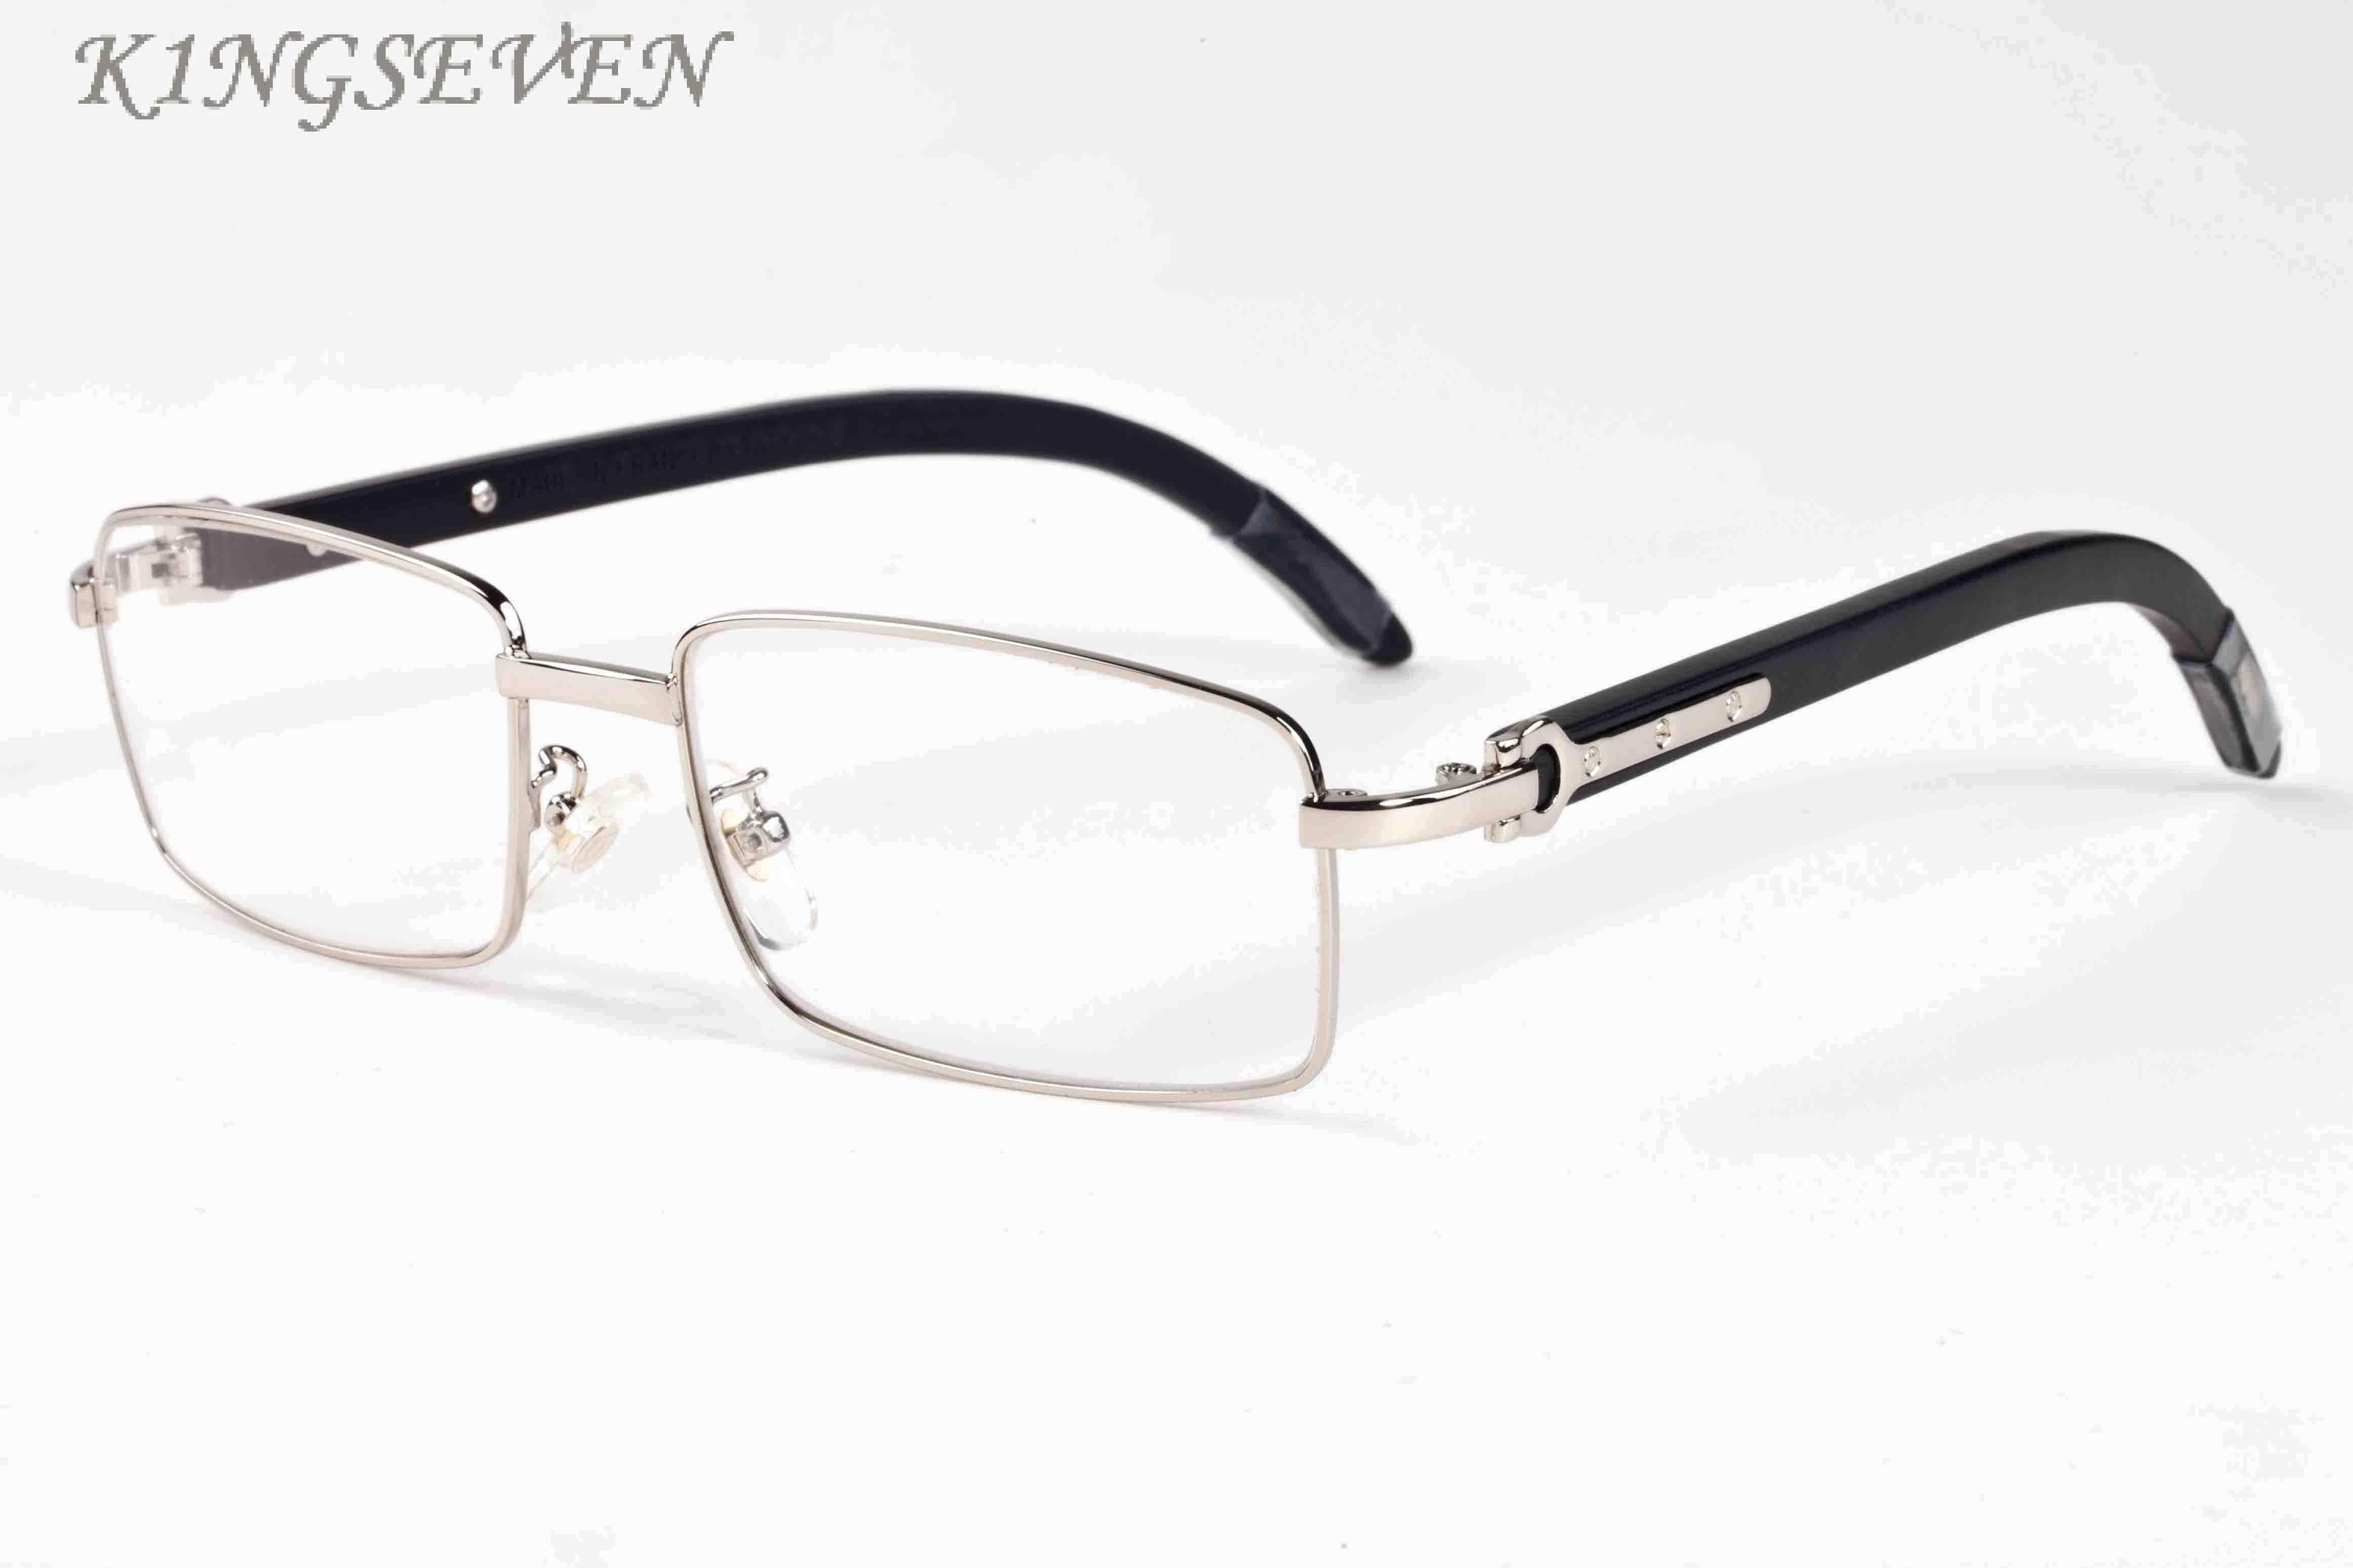 2018 high quality buffalo horn glasses for womens luxury designer sunglasses bamboo wood sunglasses full frame gold silver metal frame clear